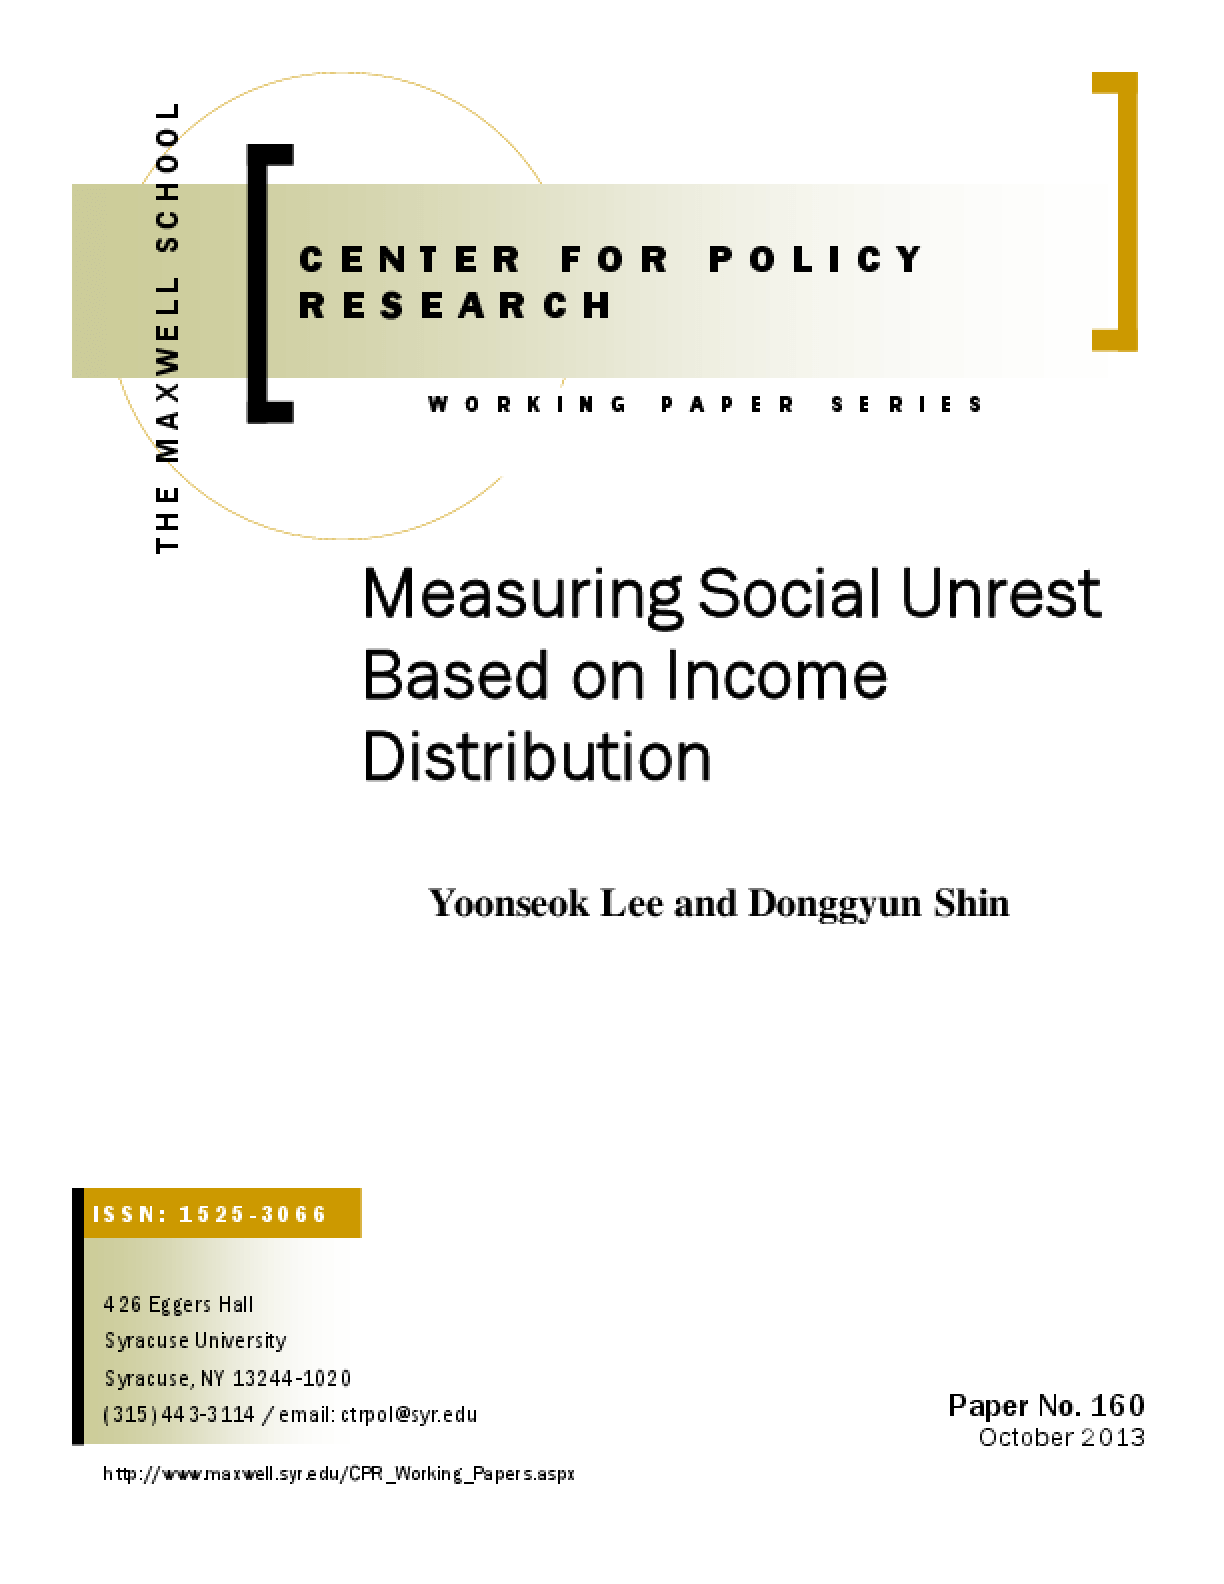 Measuring Social Unrest Based on Income Distribution